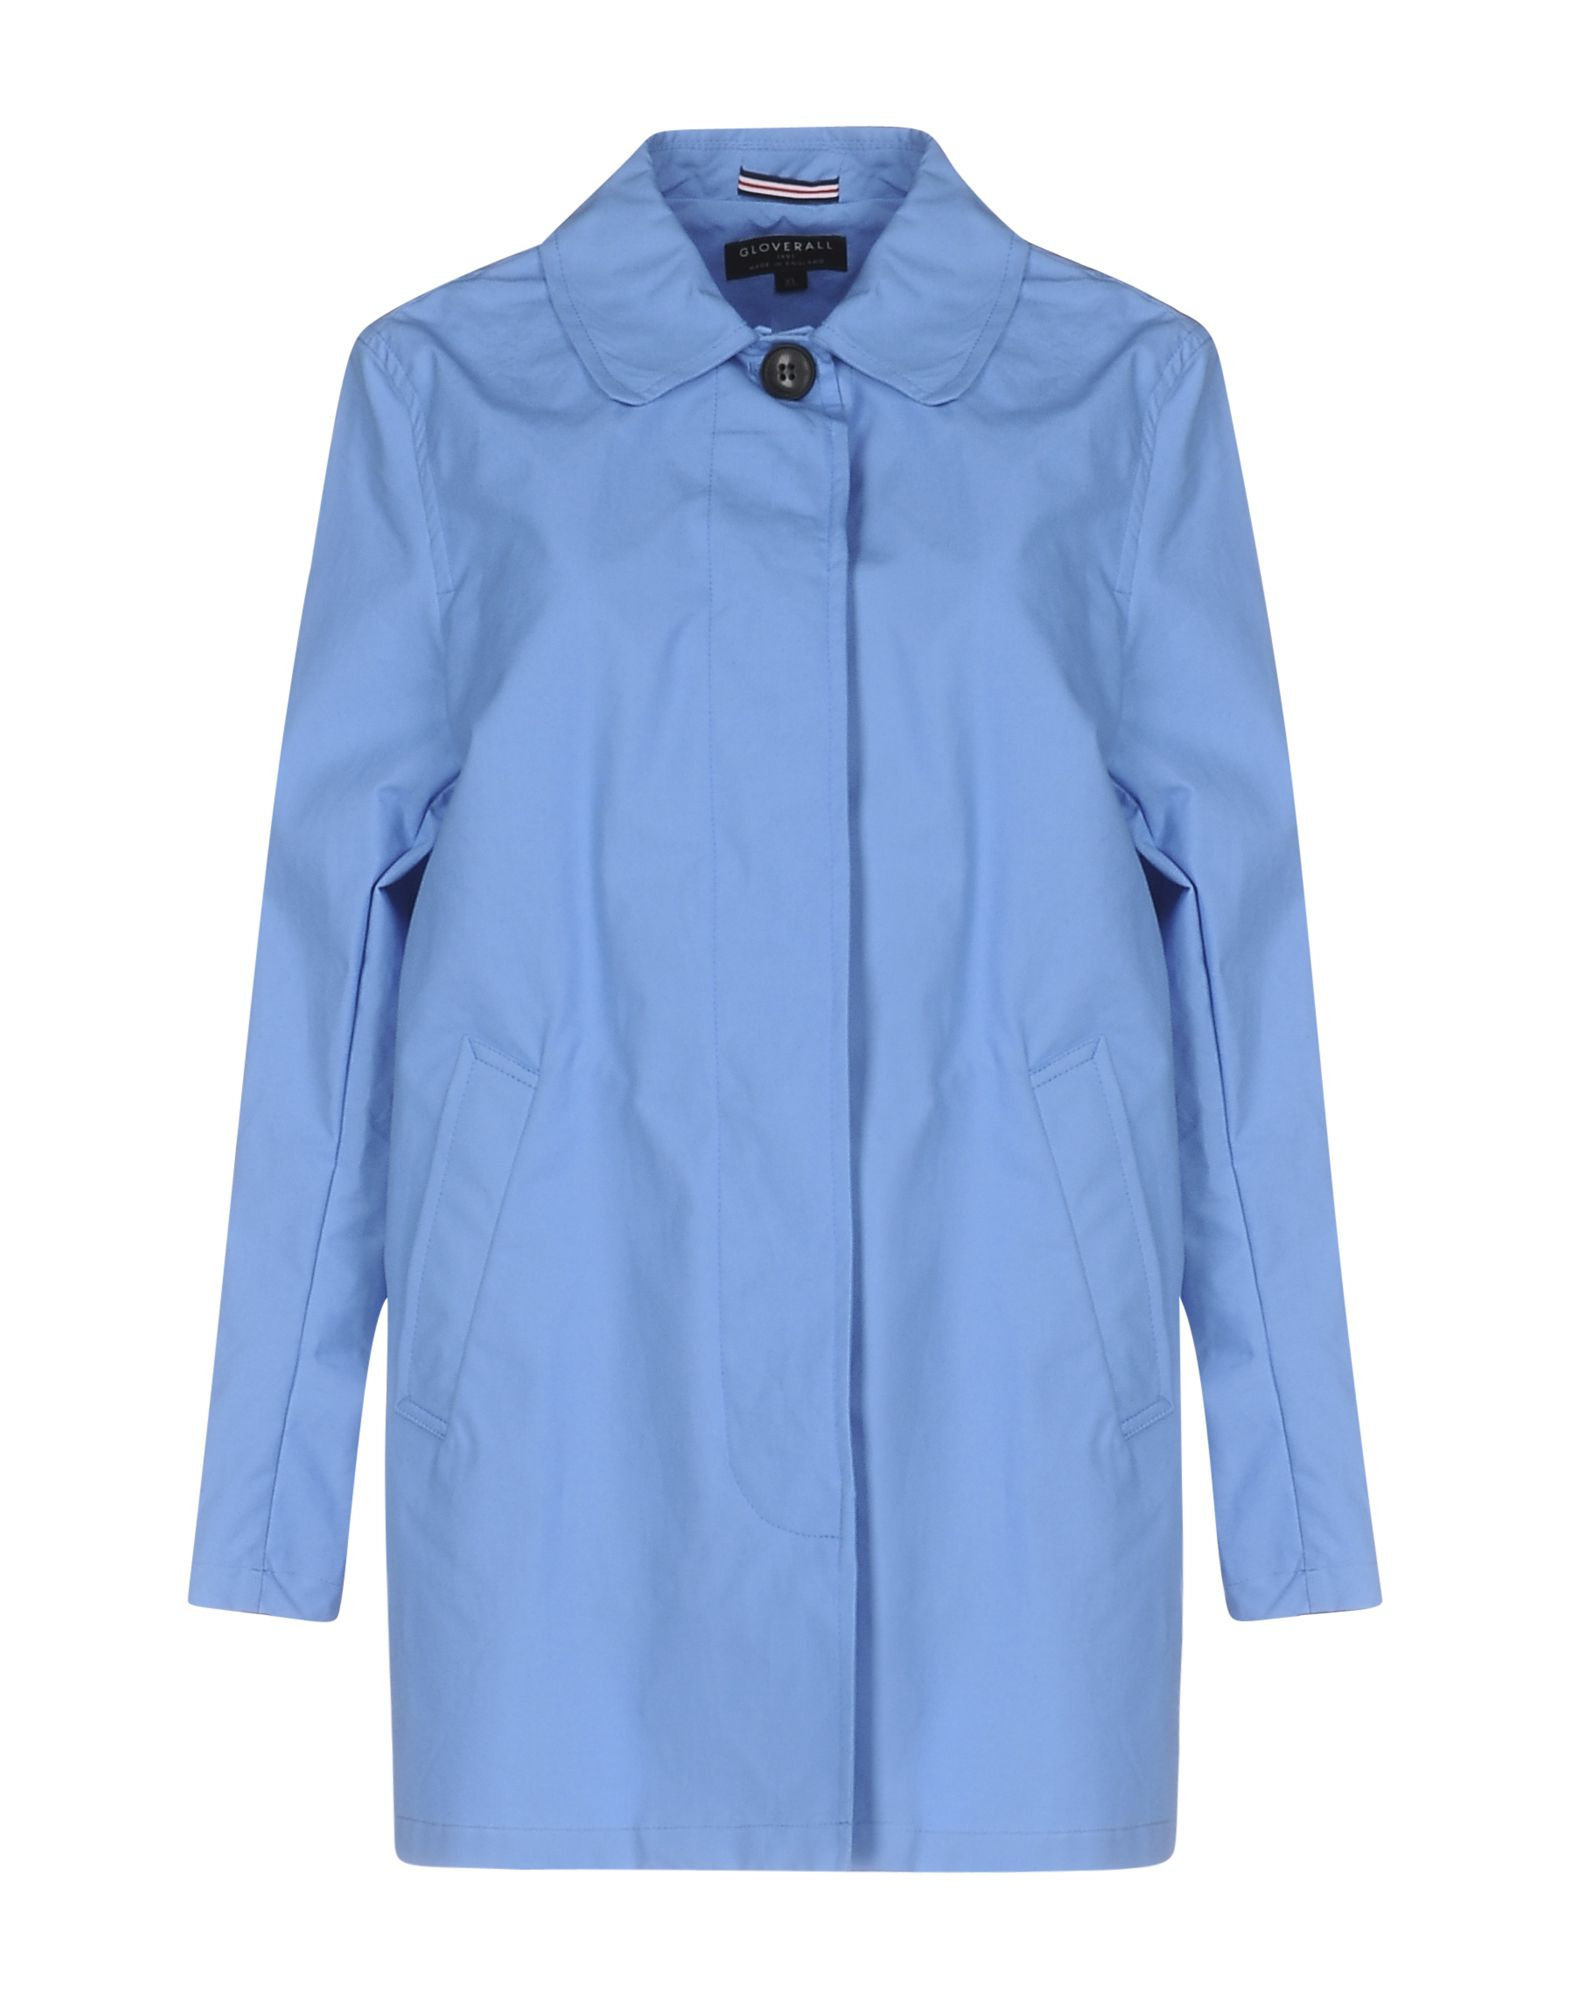 GLOVERALL Jacket in Azure